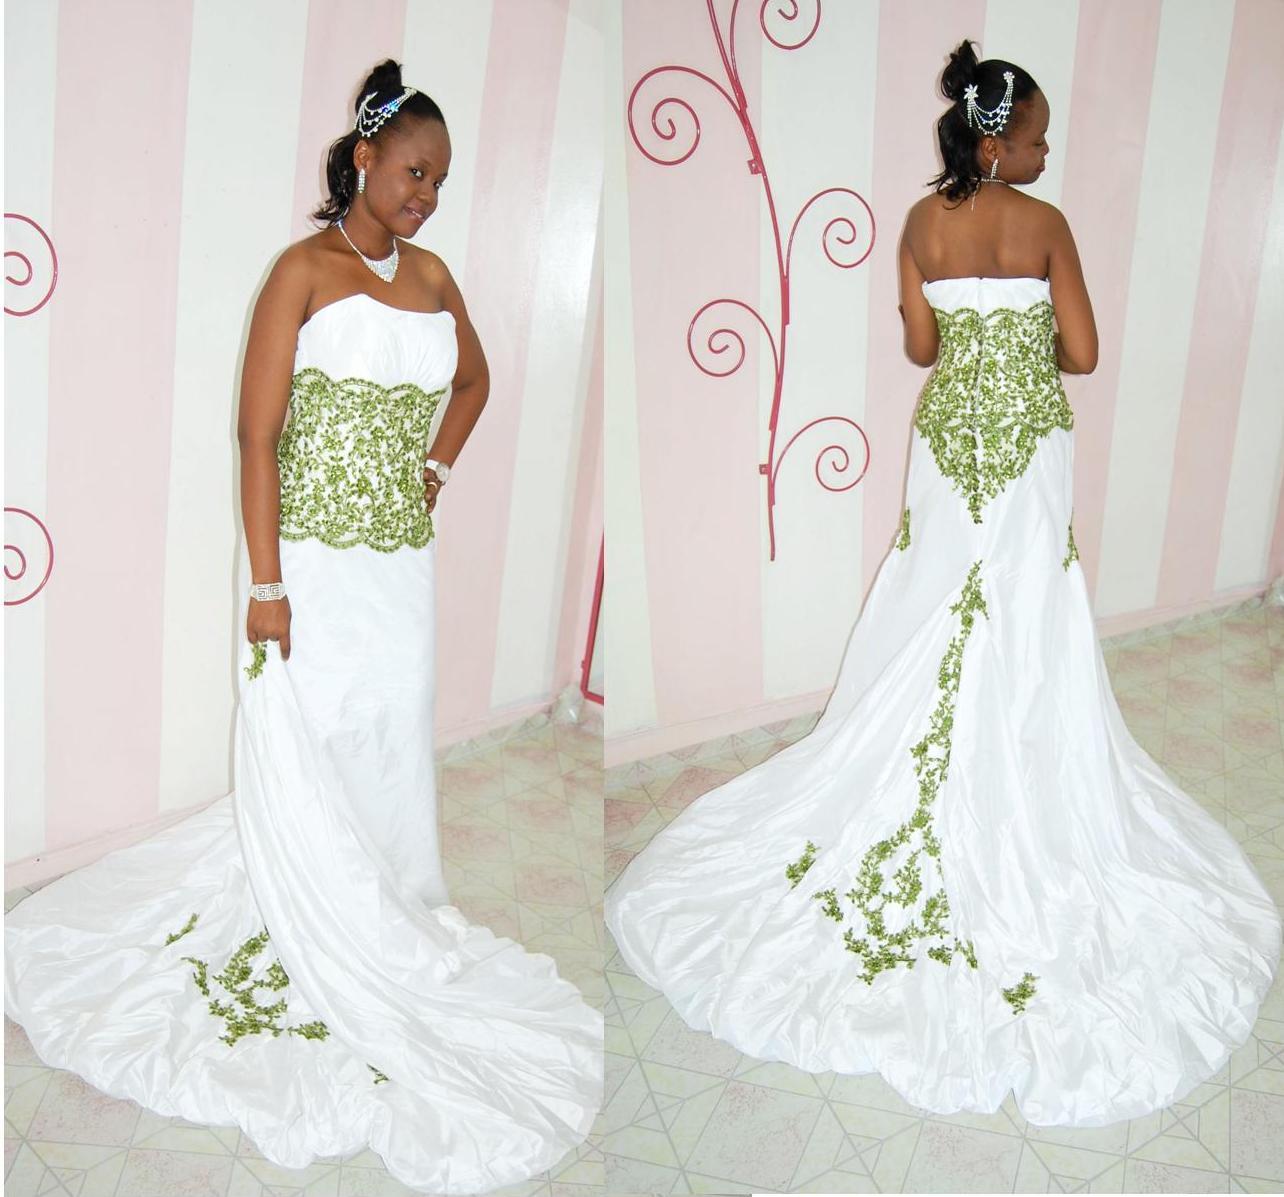 wedding dresses emerald green emerald wedding dress Wedding Dresses Emerald Green 43